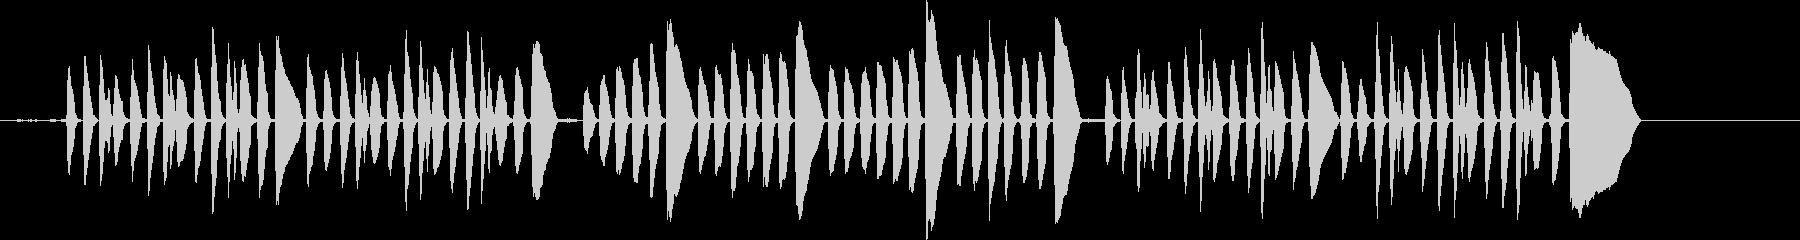 Bugle PlaysΓÇÿrev...の未再生の波形